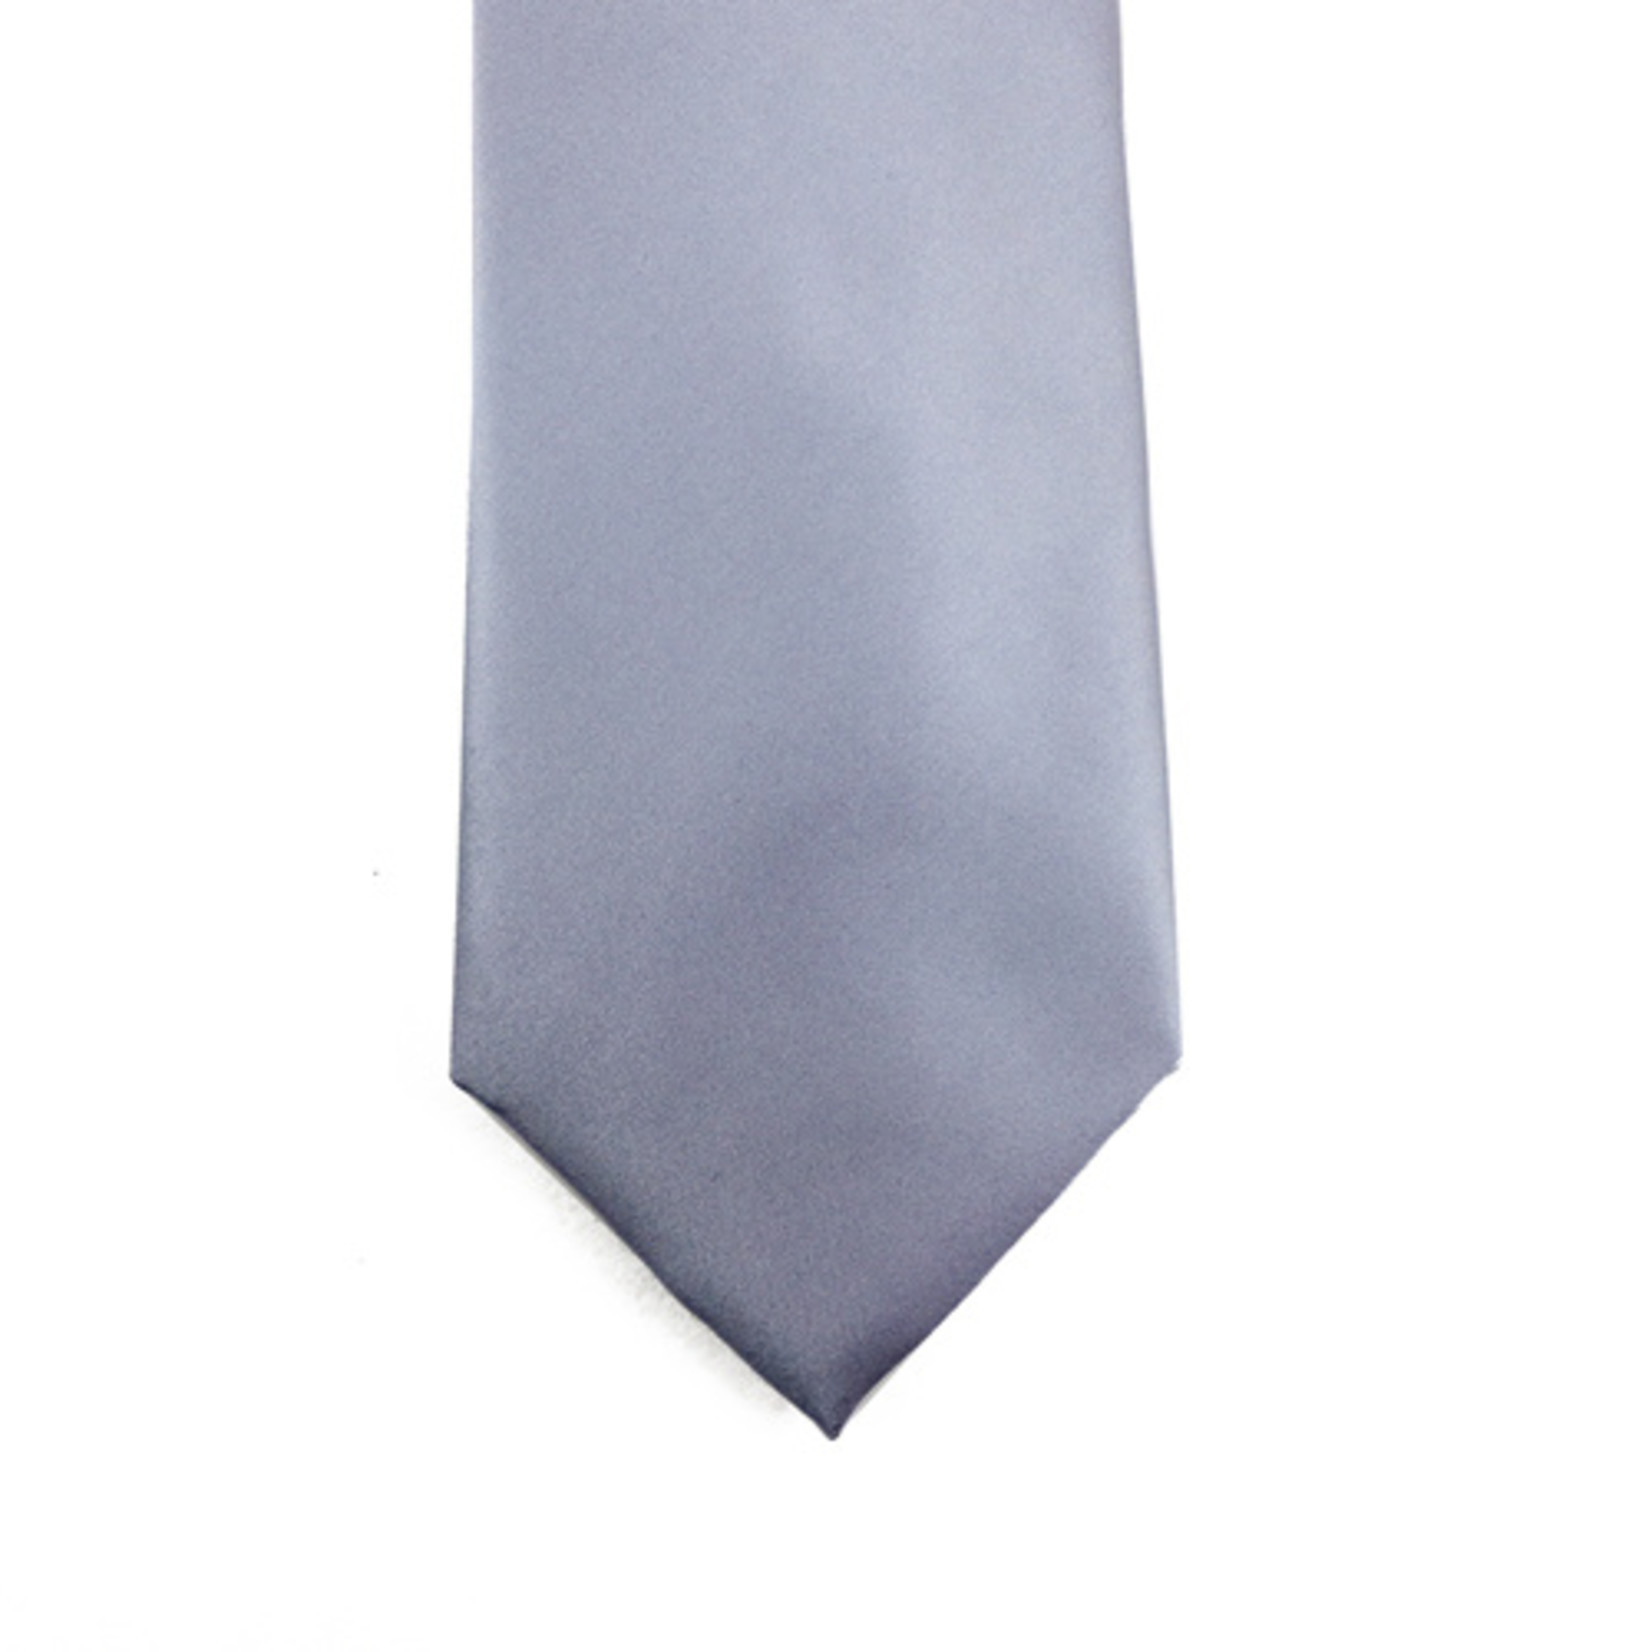 Knotz M100-17 Solid Silver Tie